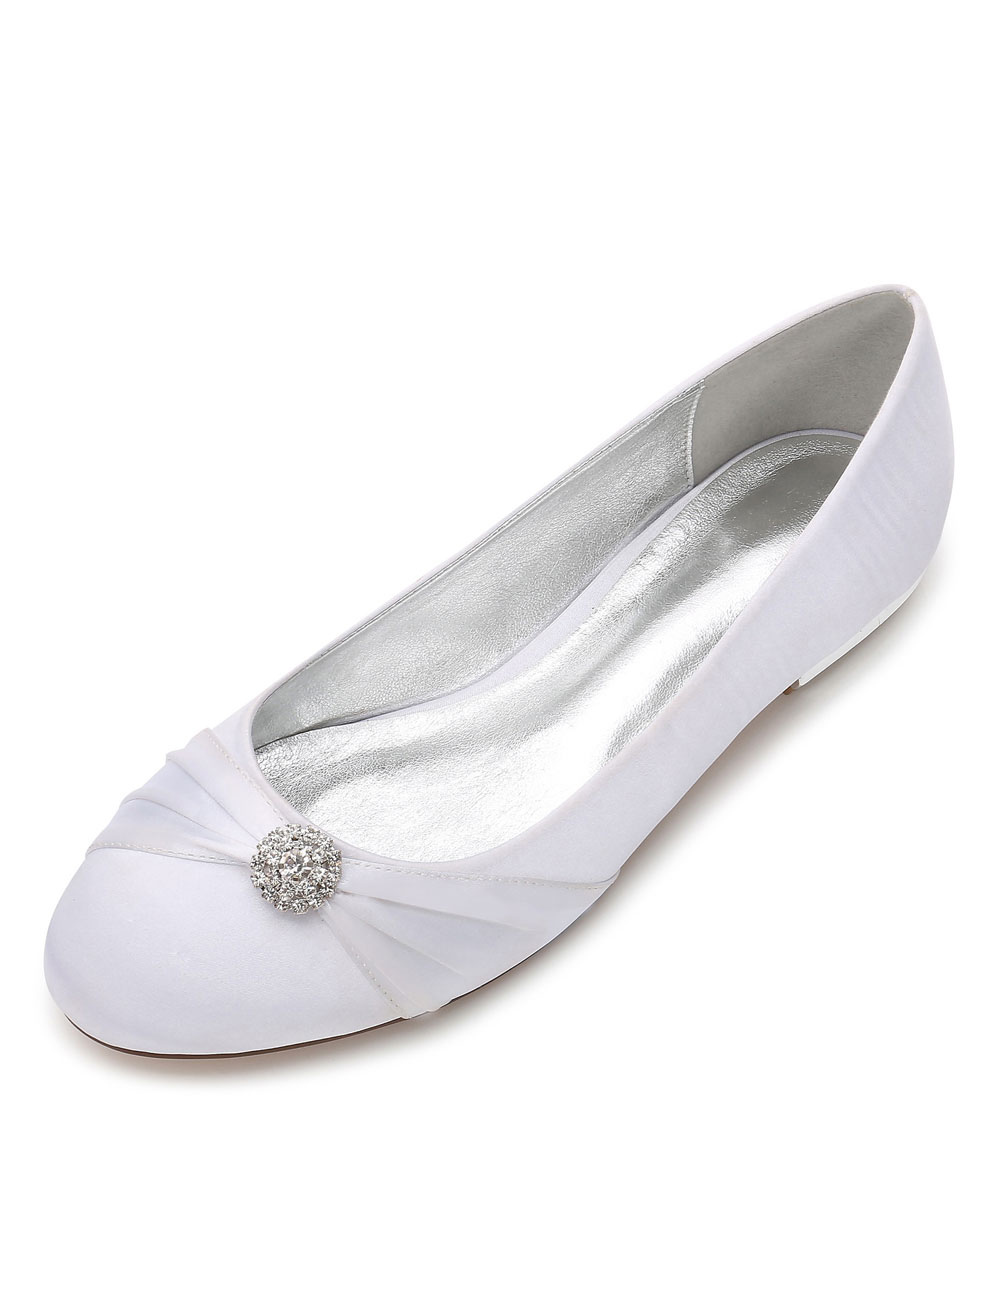 White Bridesmaid Shoes Satin Round Toe